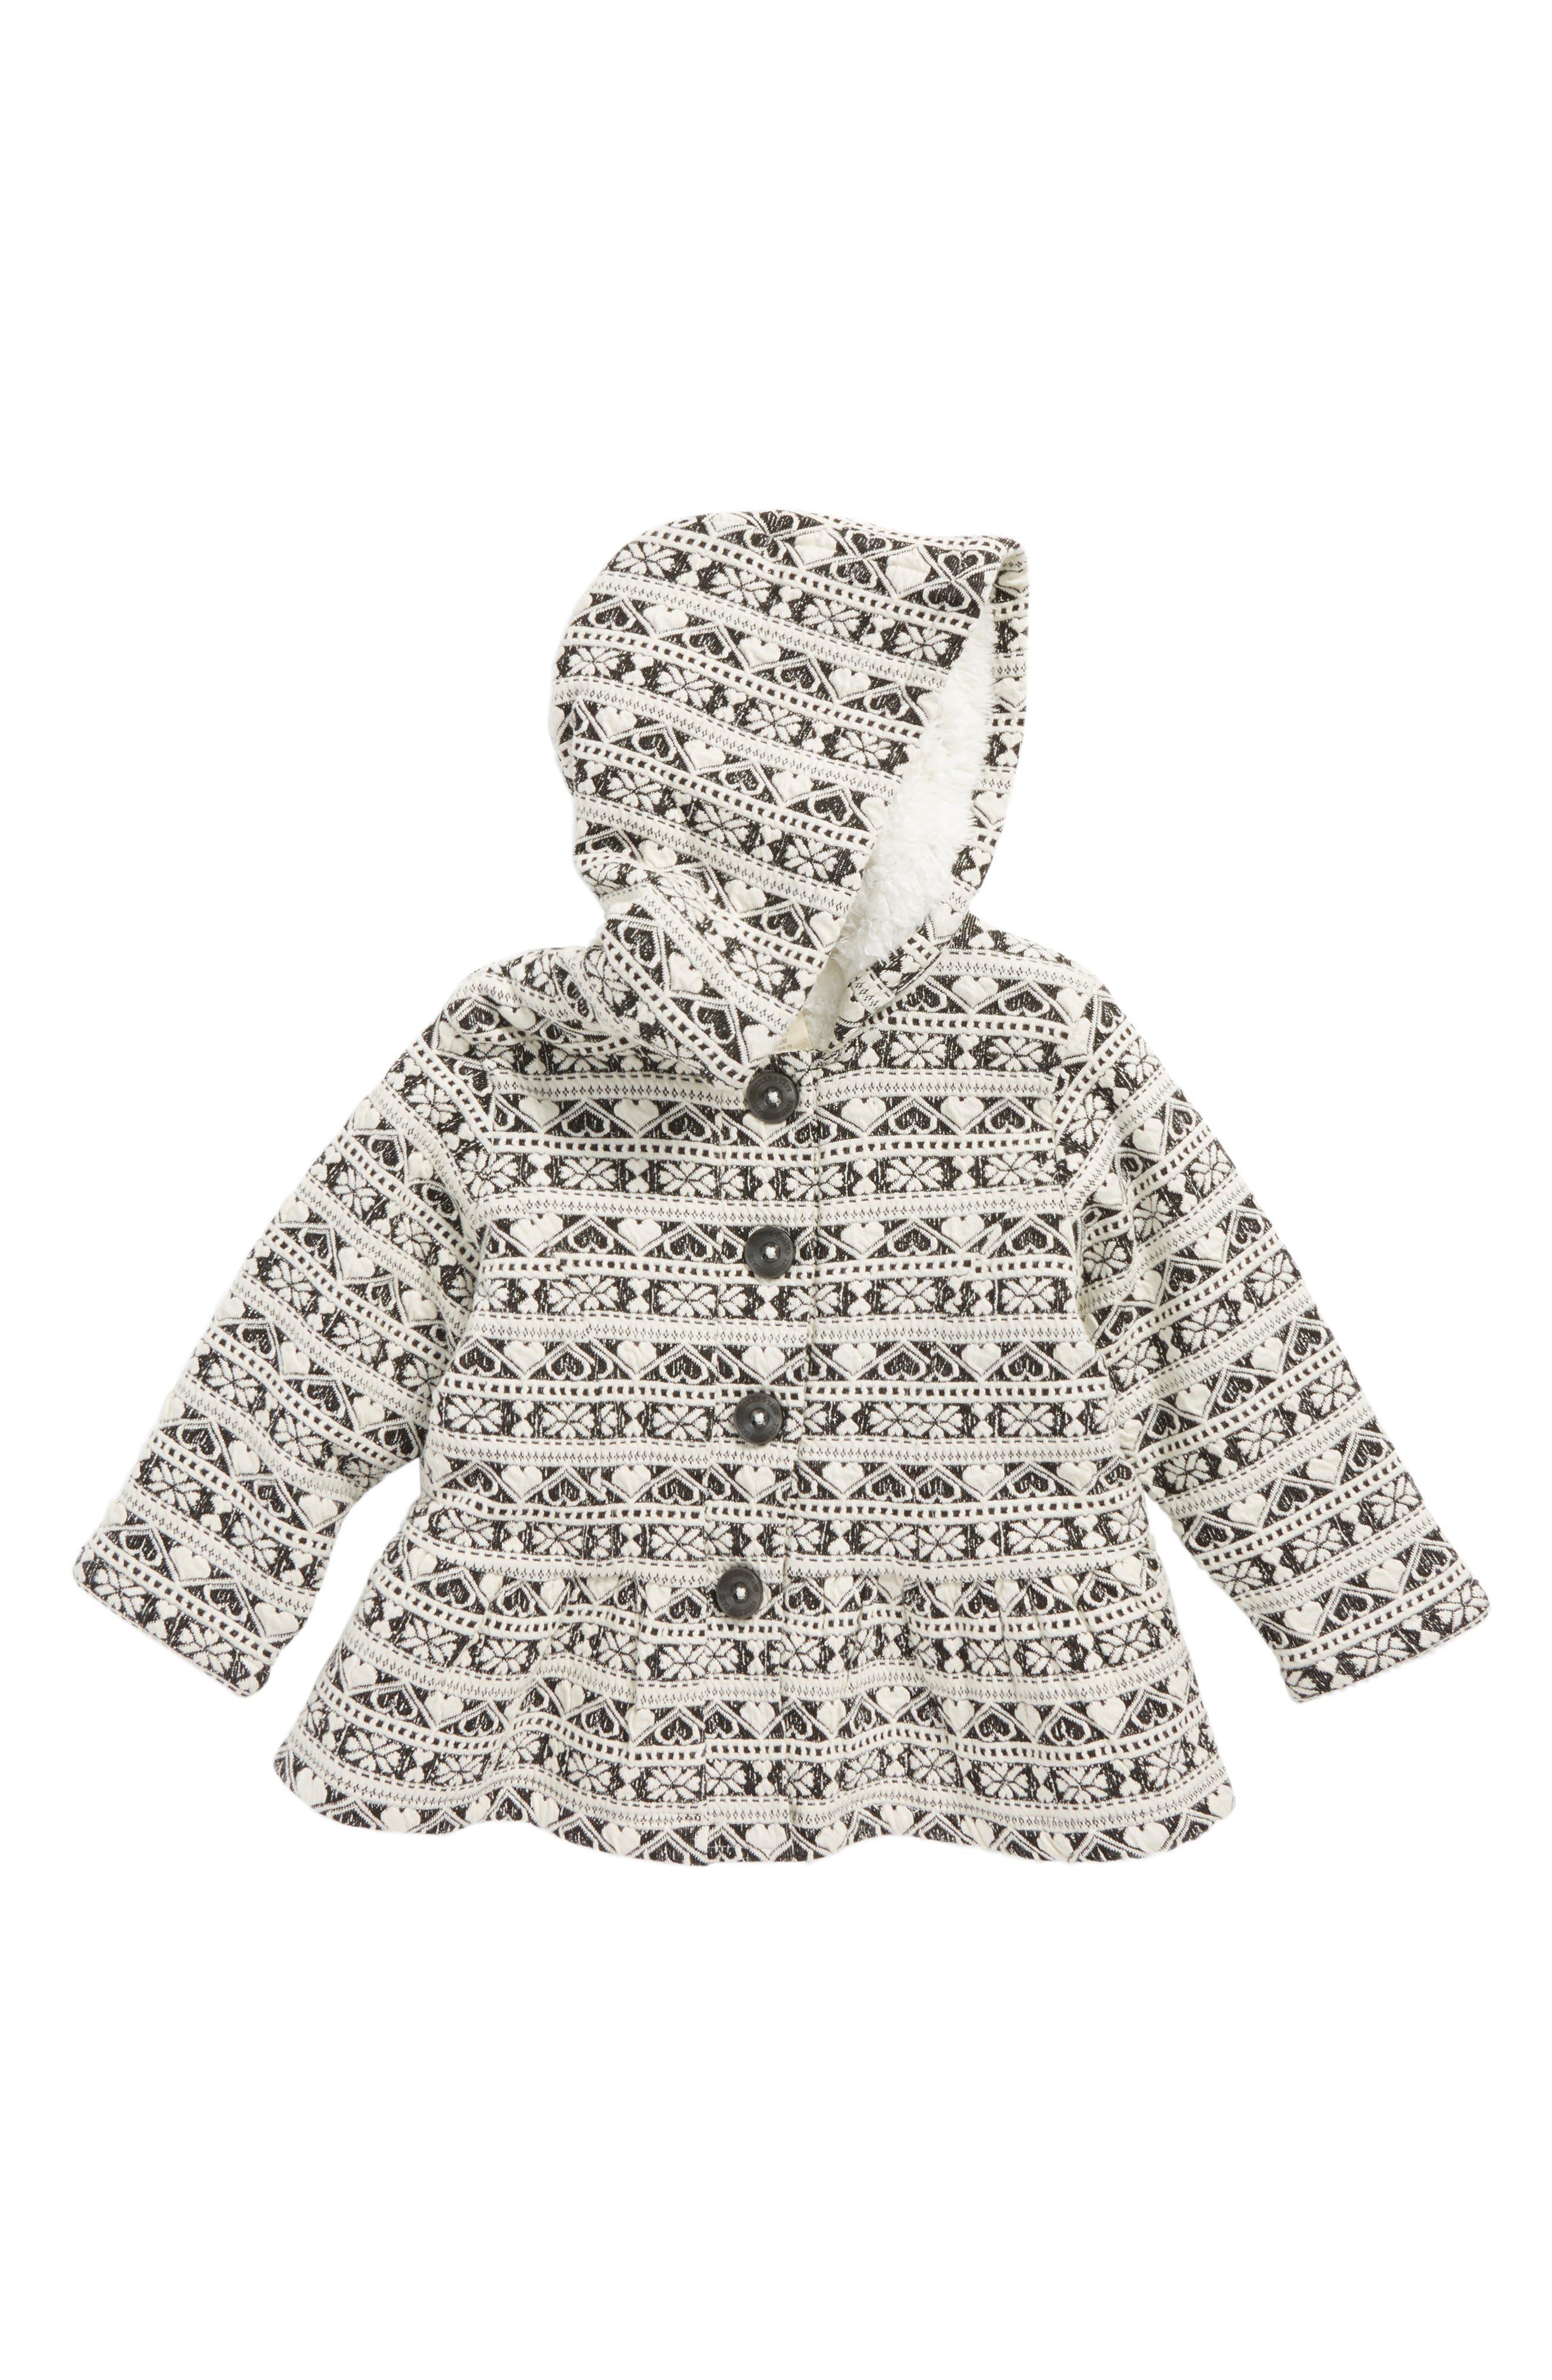 Alternate Image 1 Selected - Tucker + Tate Hooded Peplum Jacket with Plush Lining (Baby Girls)